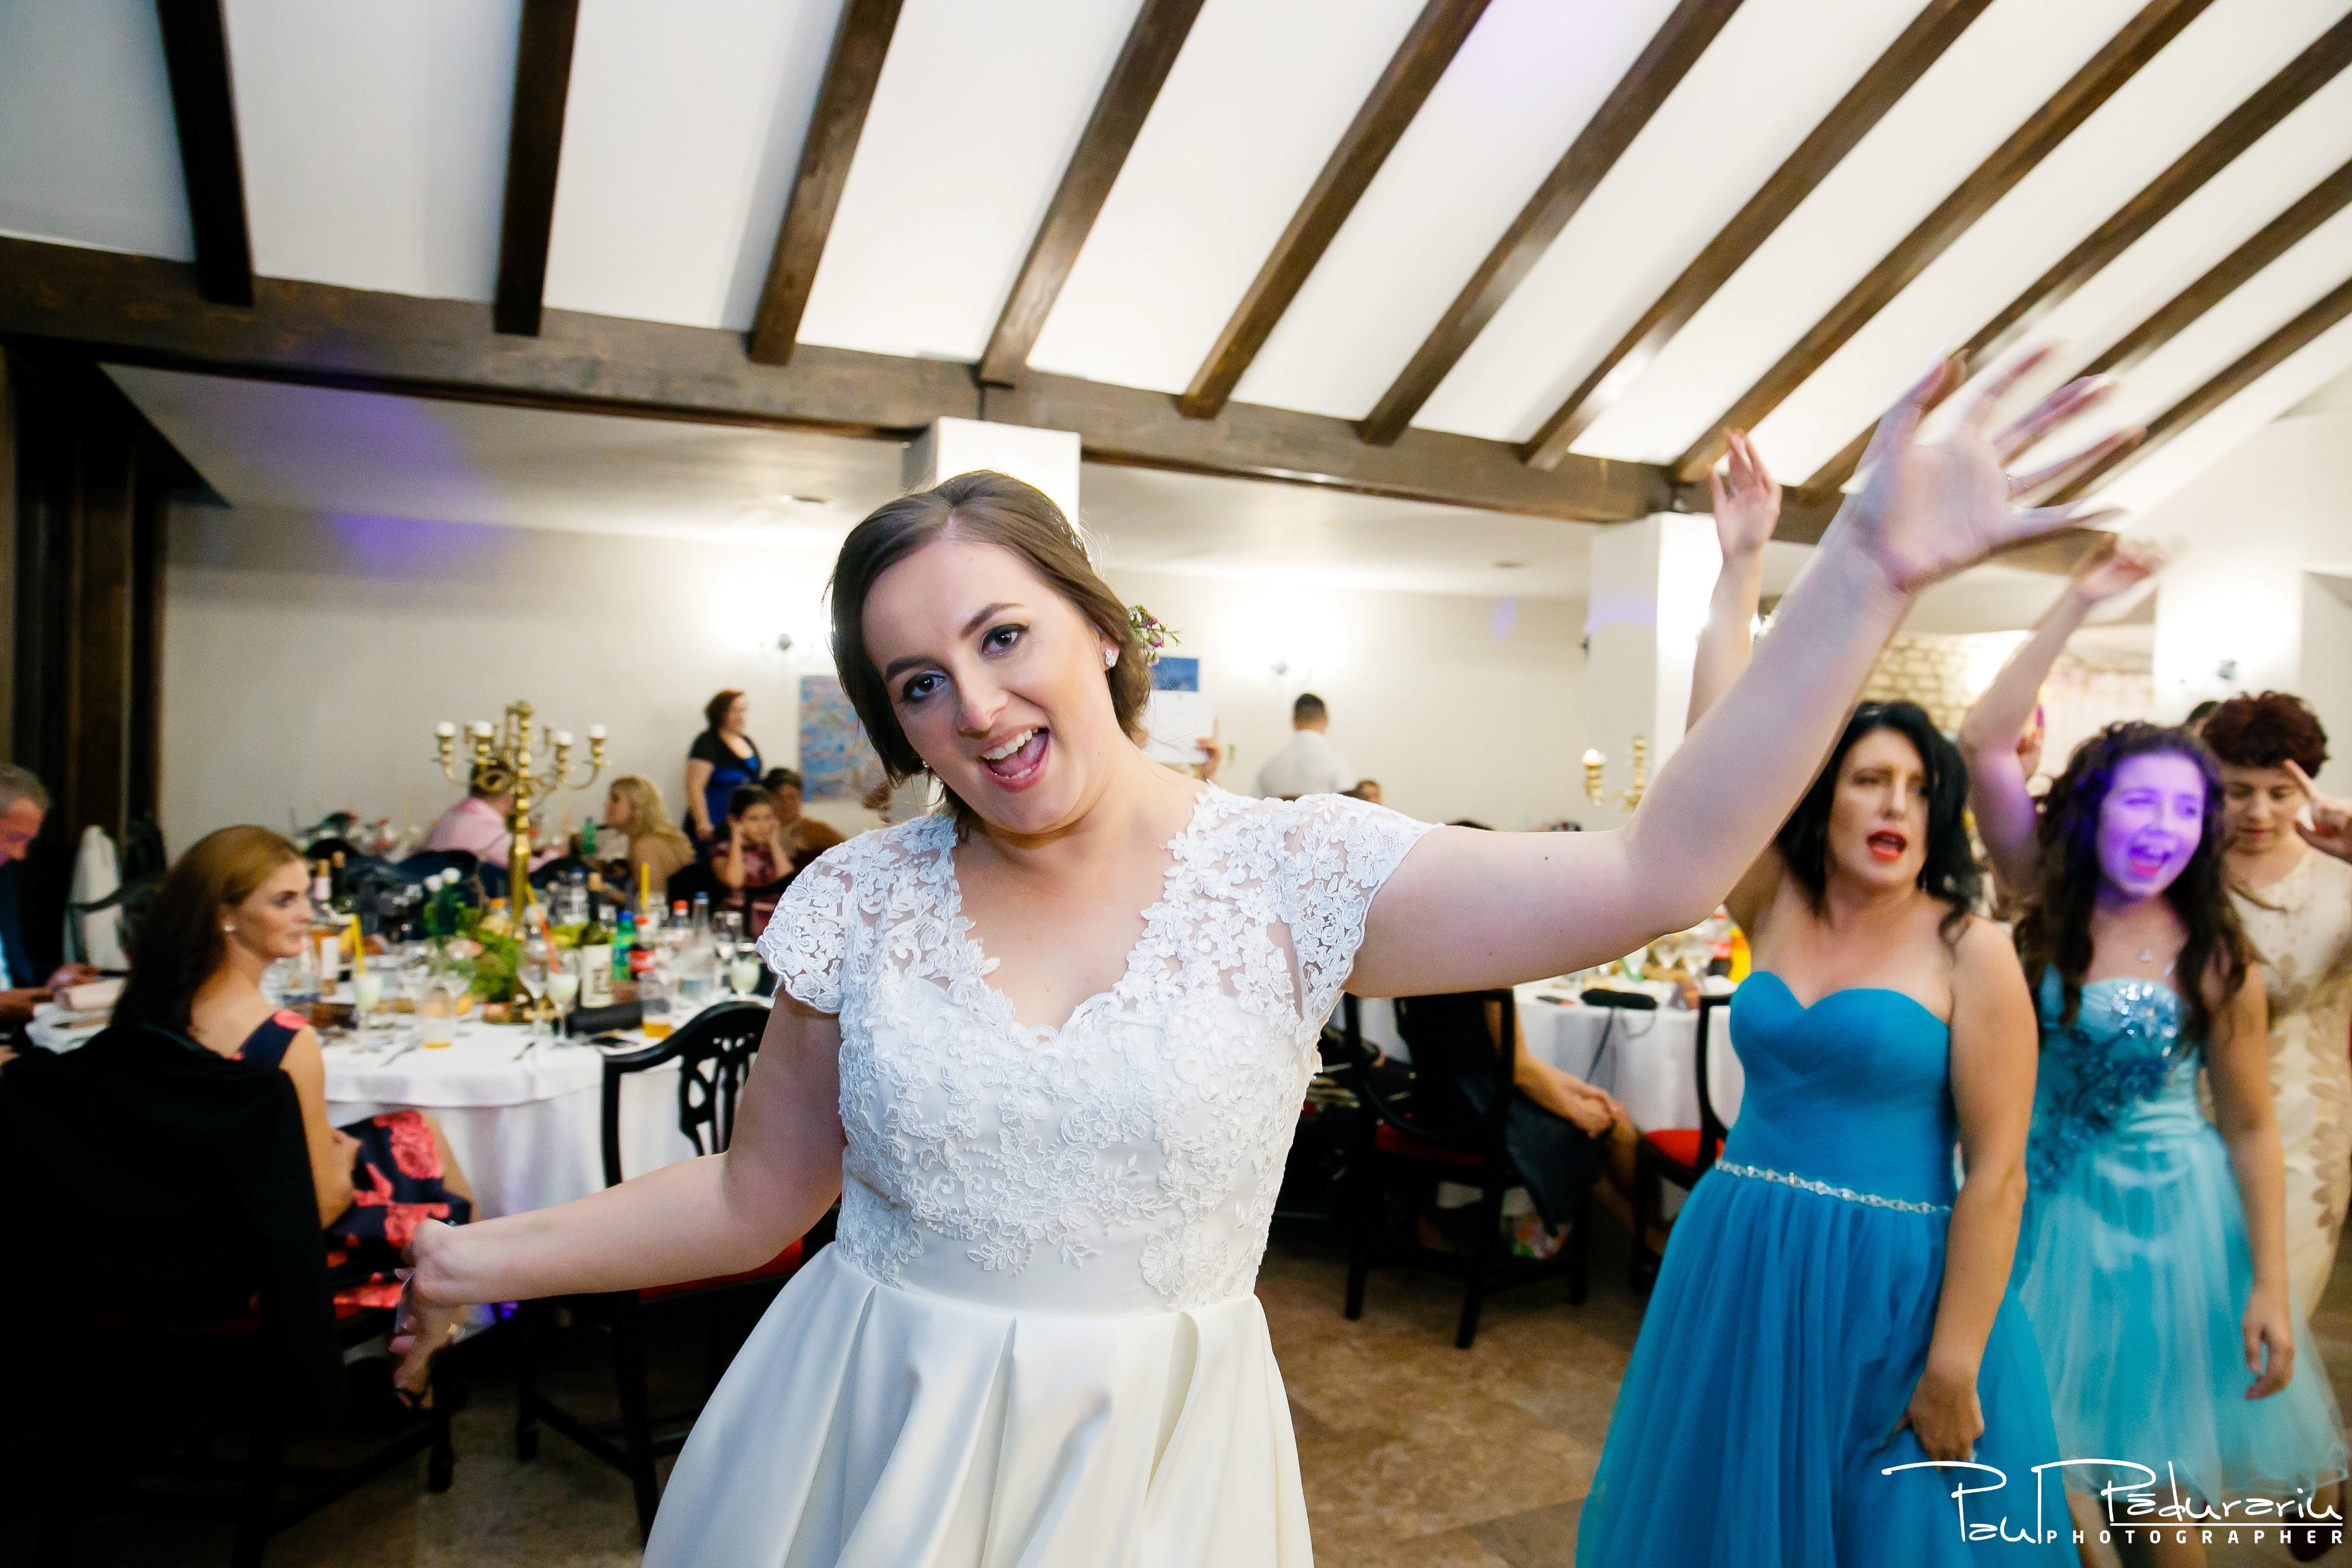 Cristina si Razvan nunta rustica la Bellaria Loja Domneasca petrecere nunta moment dans mireasa fotograf profesionist nunta Iasi www.paulpadurariu.ro © 2017 Paul Padurariu